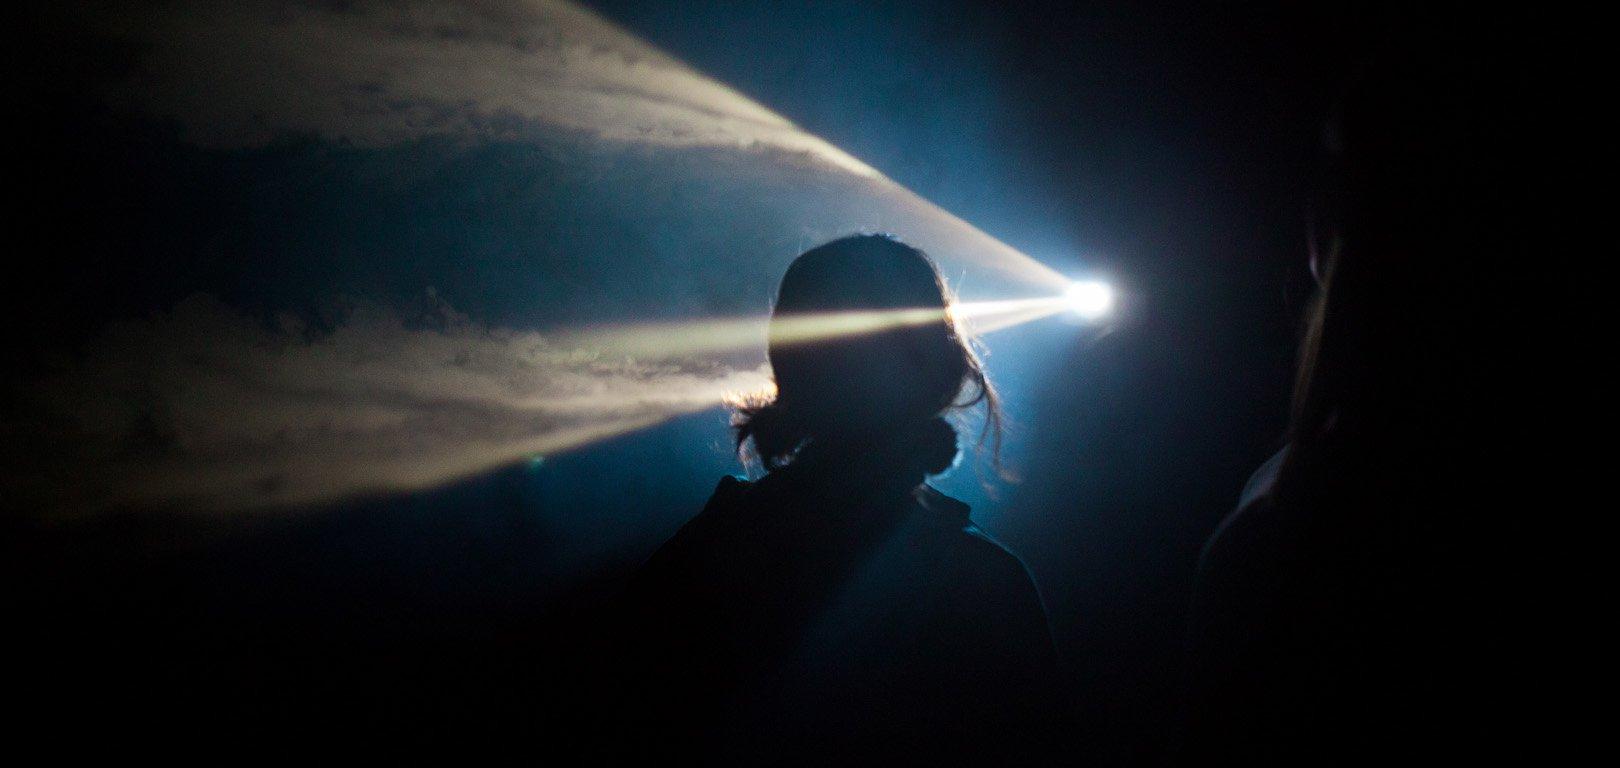 Anthony McCall - You and I – Horizontal II - Silhouette